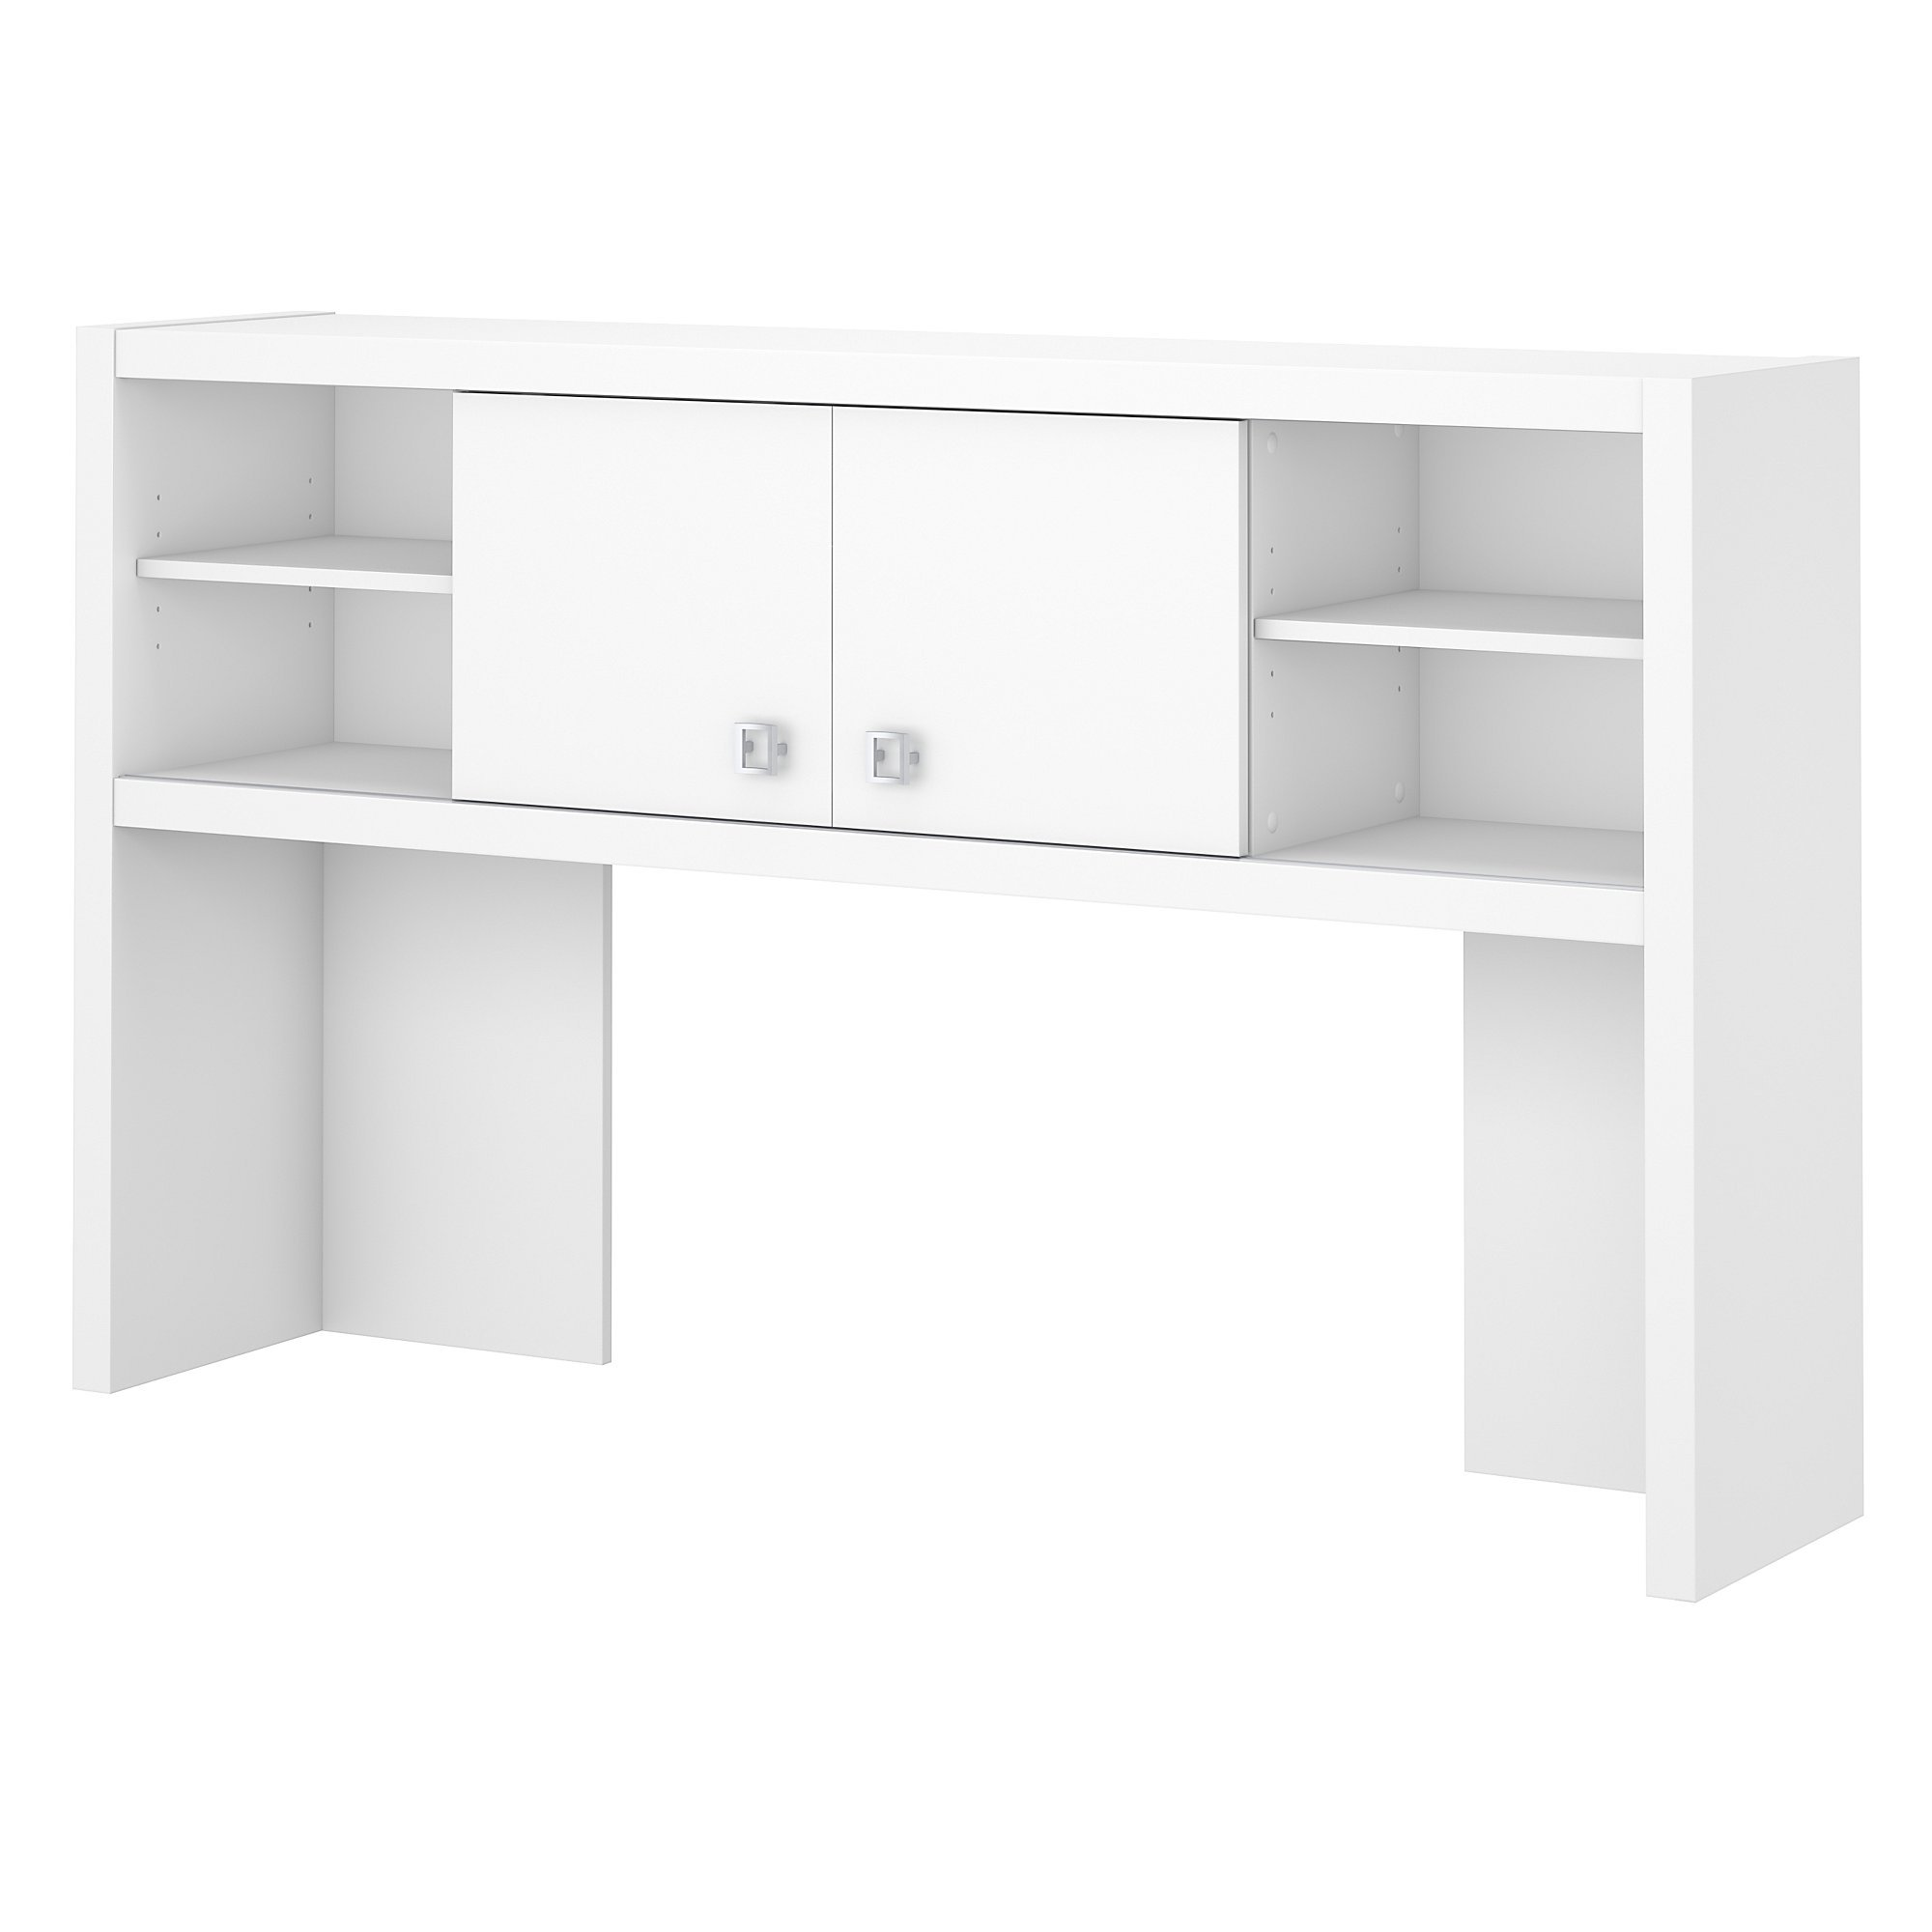 Office by kathy ireland Echo 60W Hutch in Pure White by Office by kathy ireland